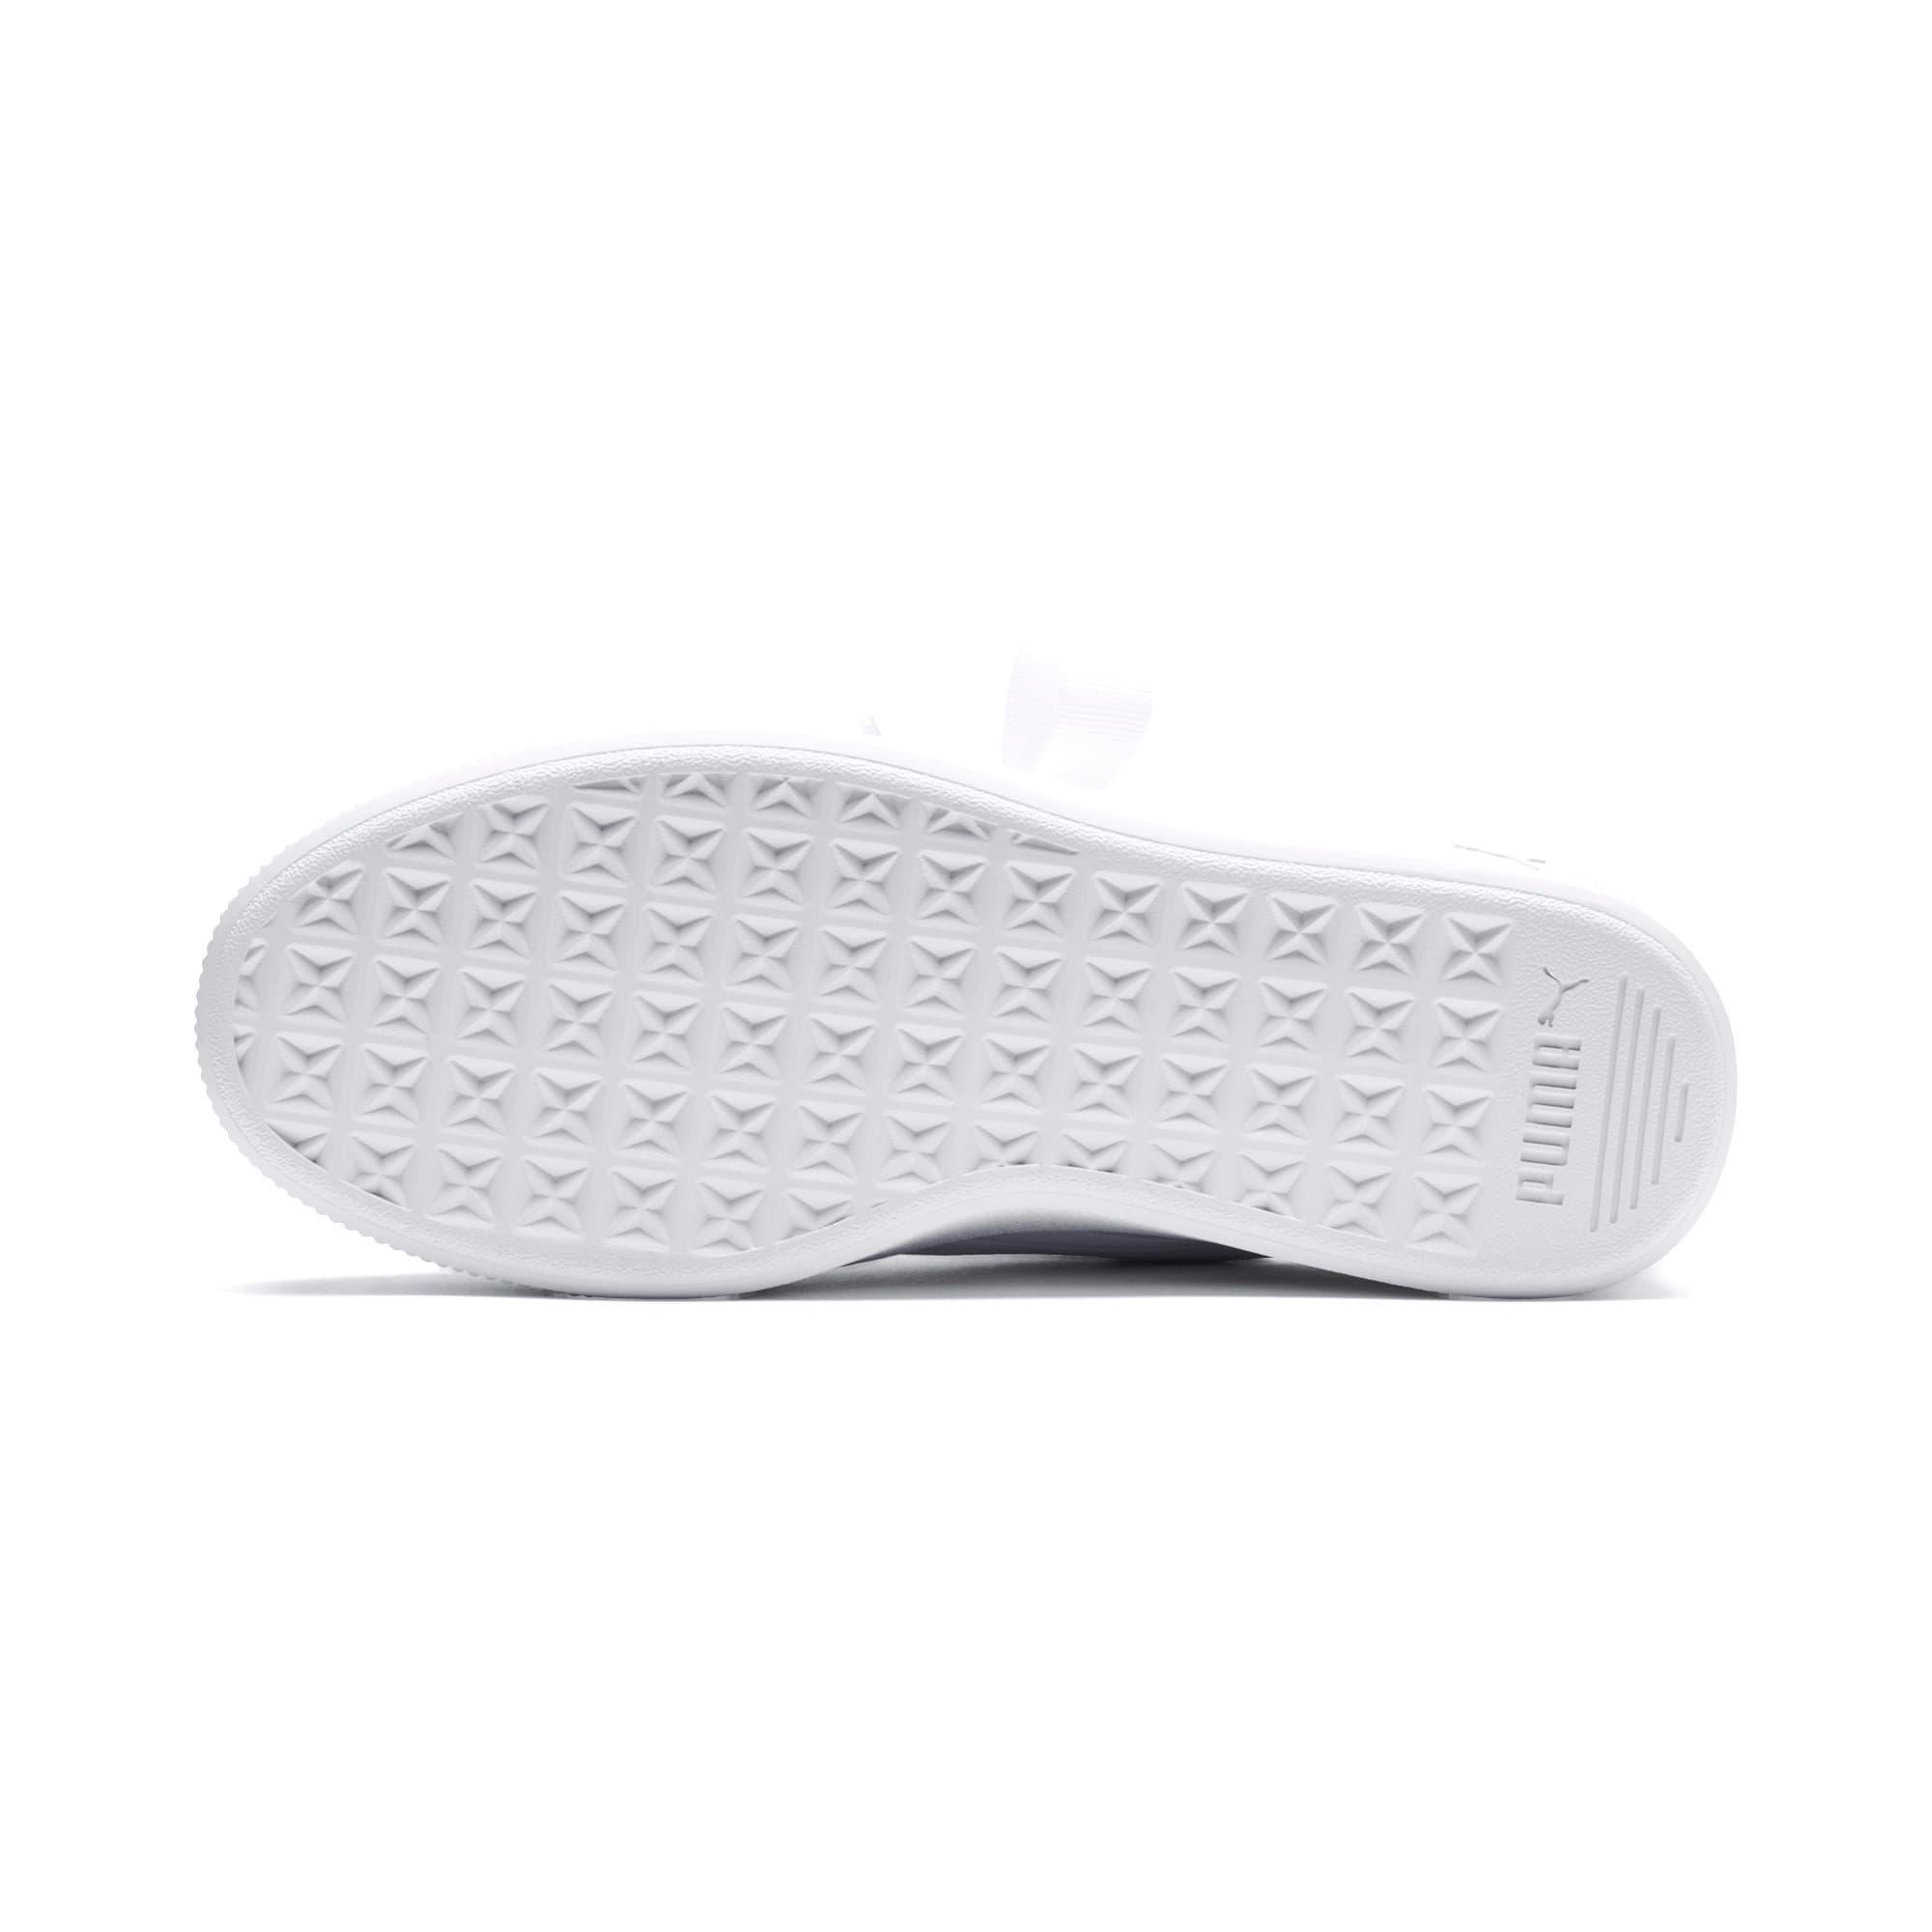 Thumbnail 4 of PUMA Vikky Stacked Ribbon Core Women's Sneakers, Puma White-Puma White, medium